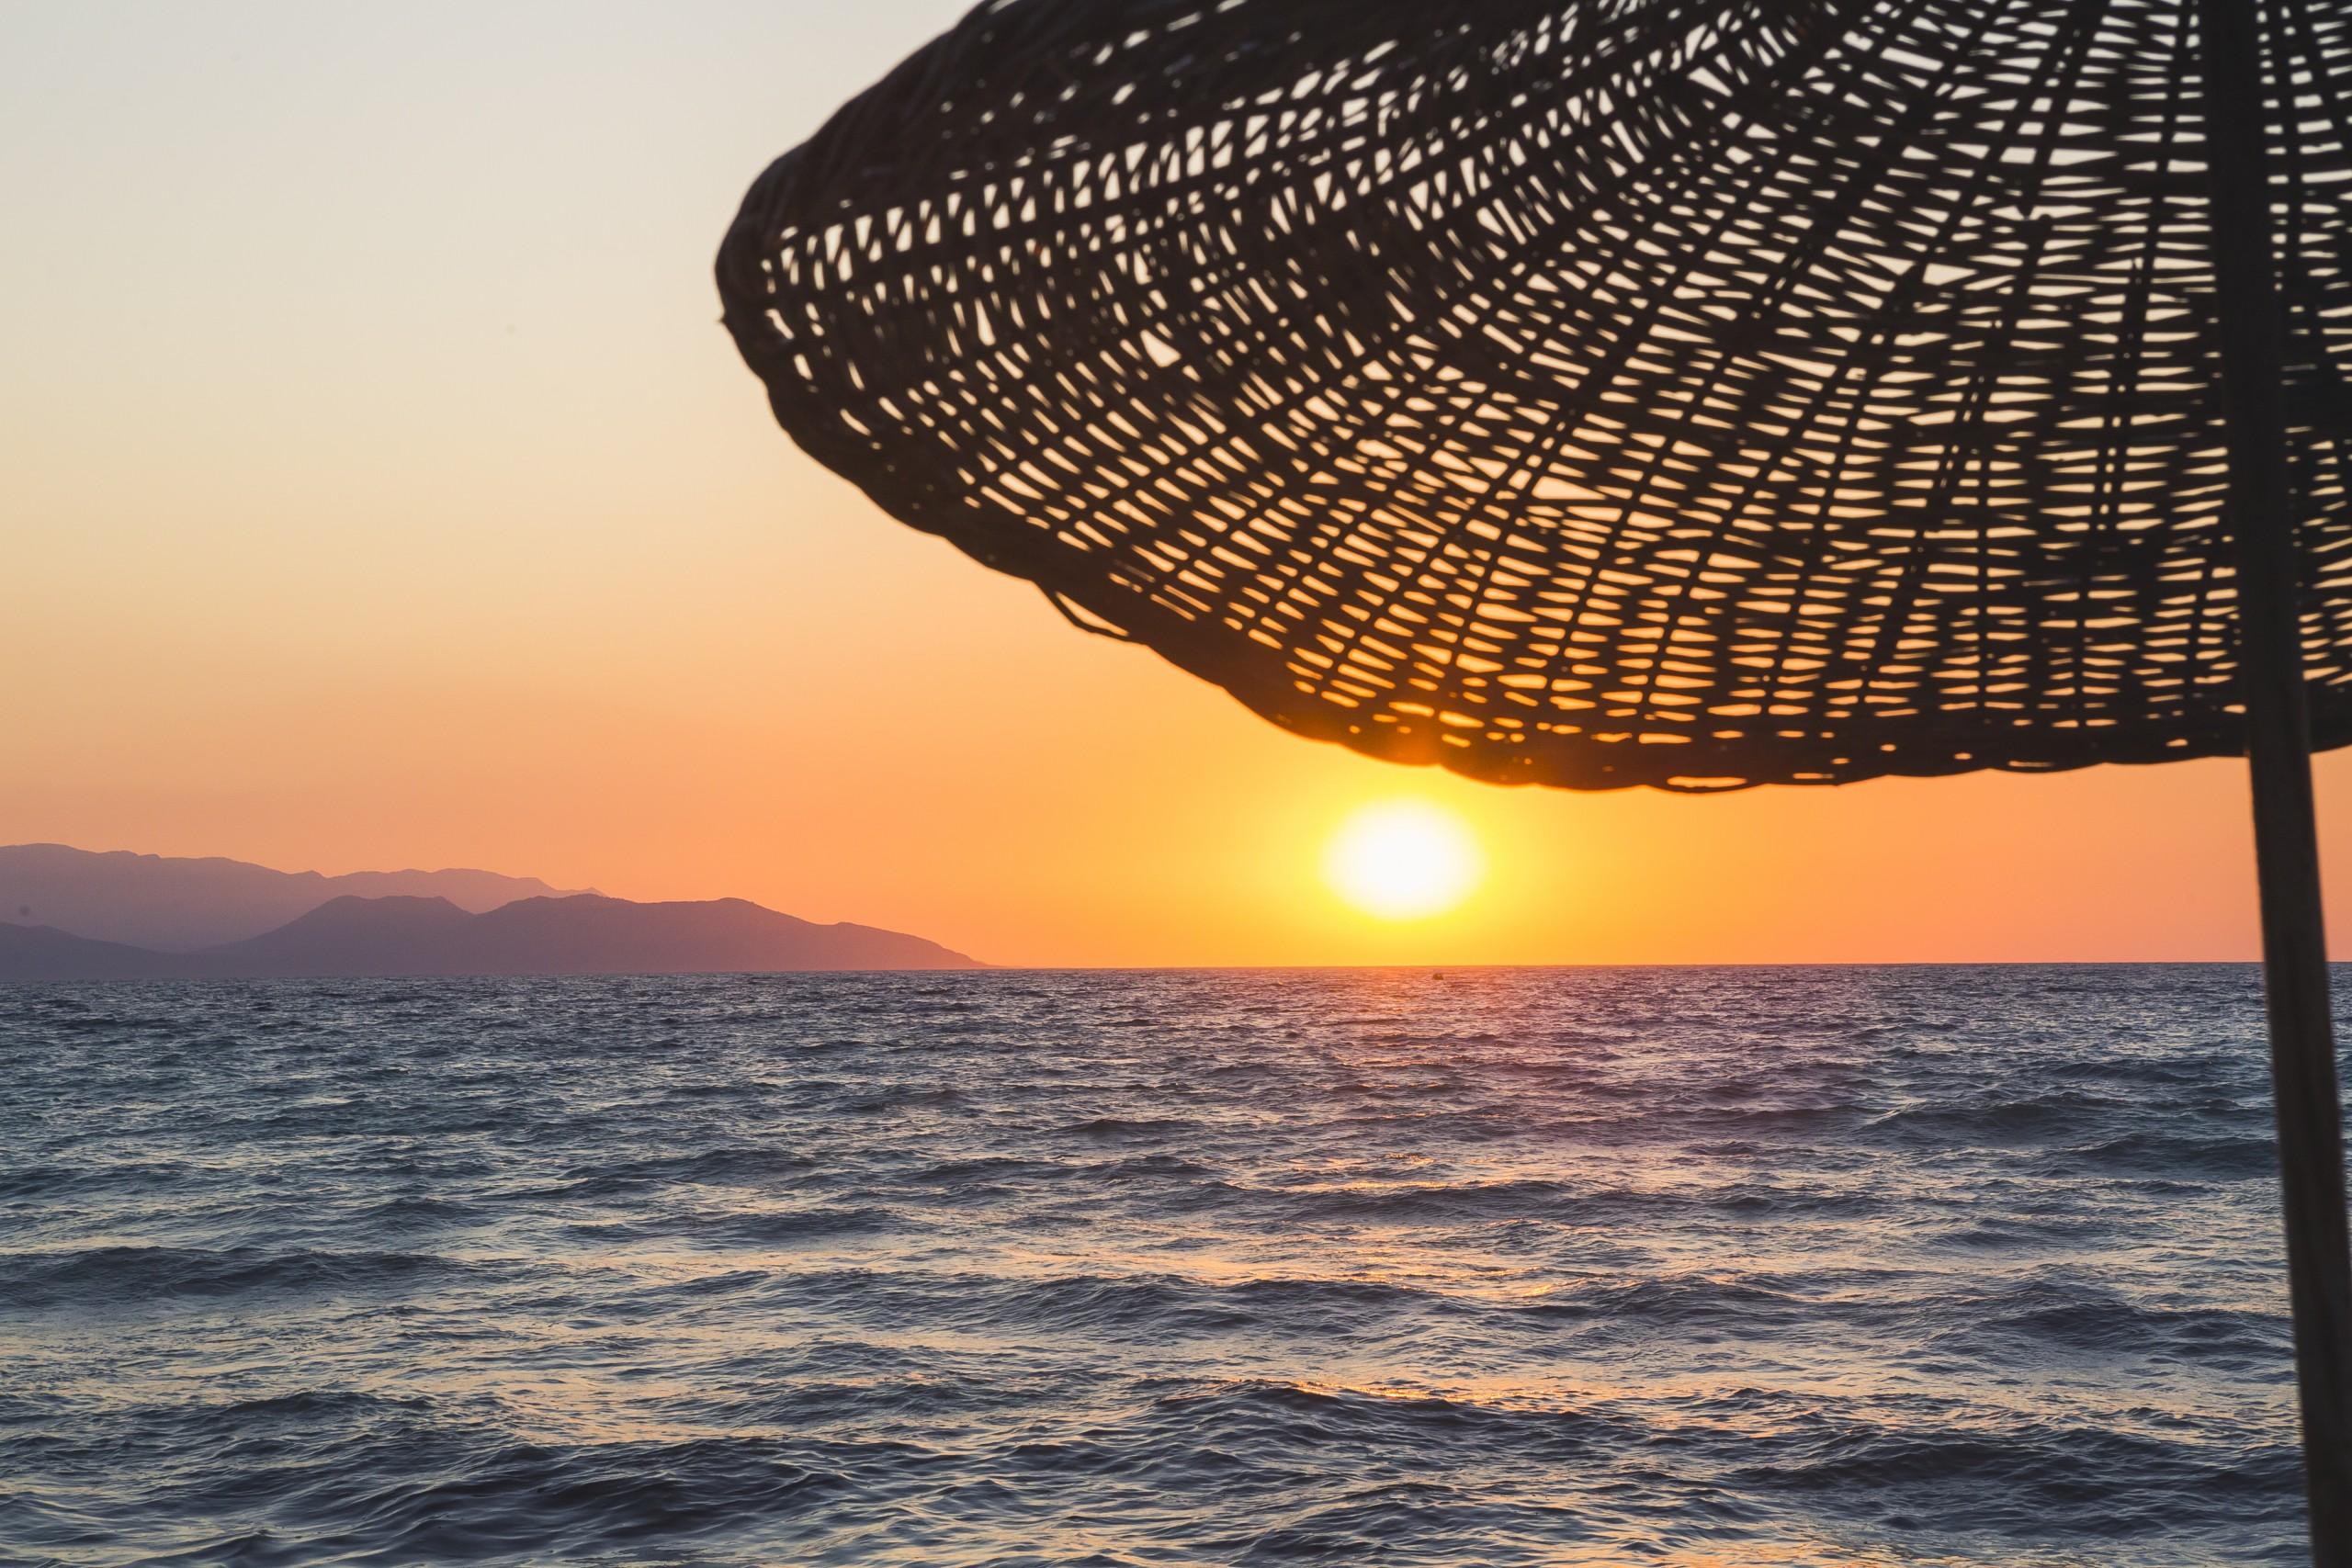 Straw umbrella and sunset